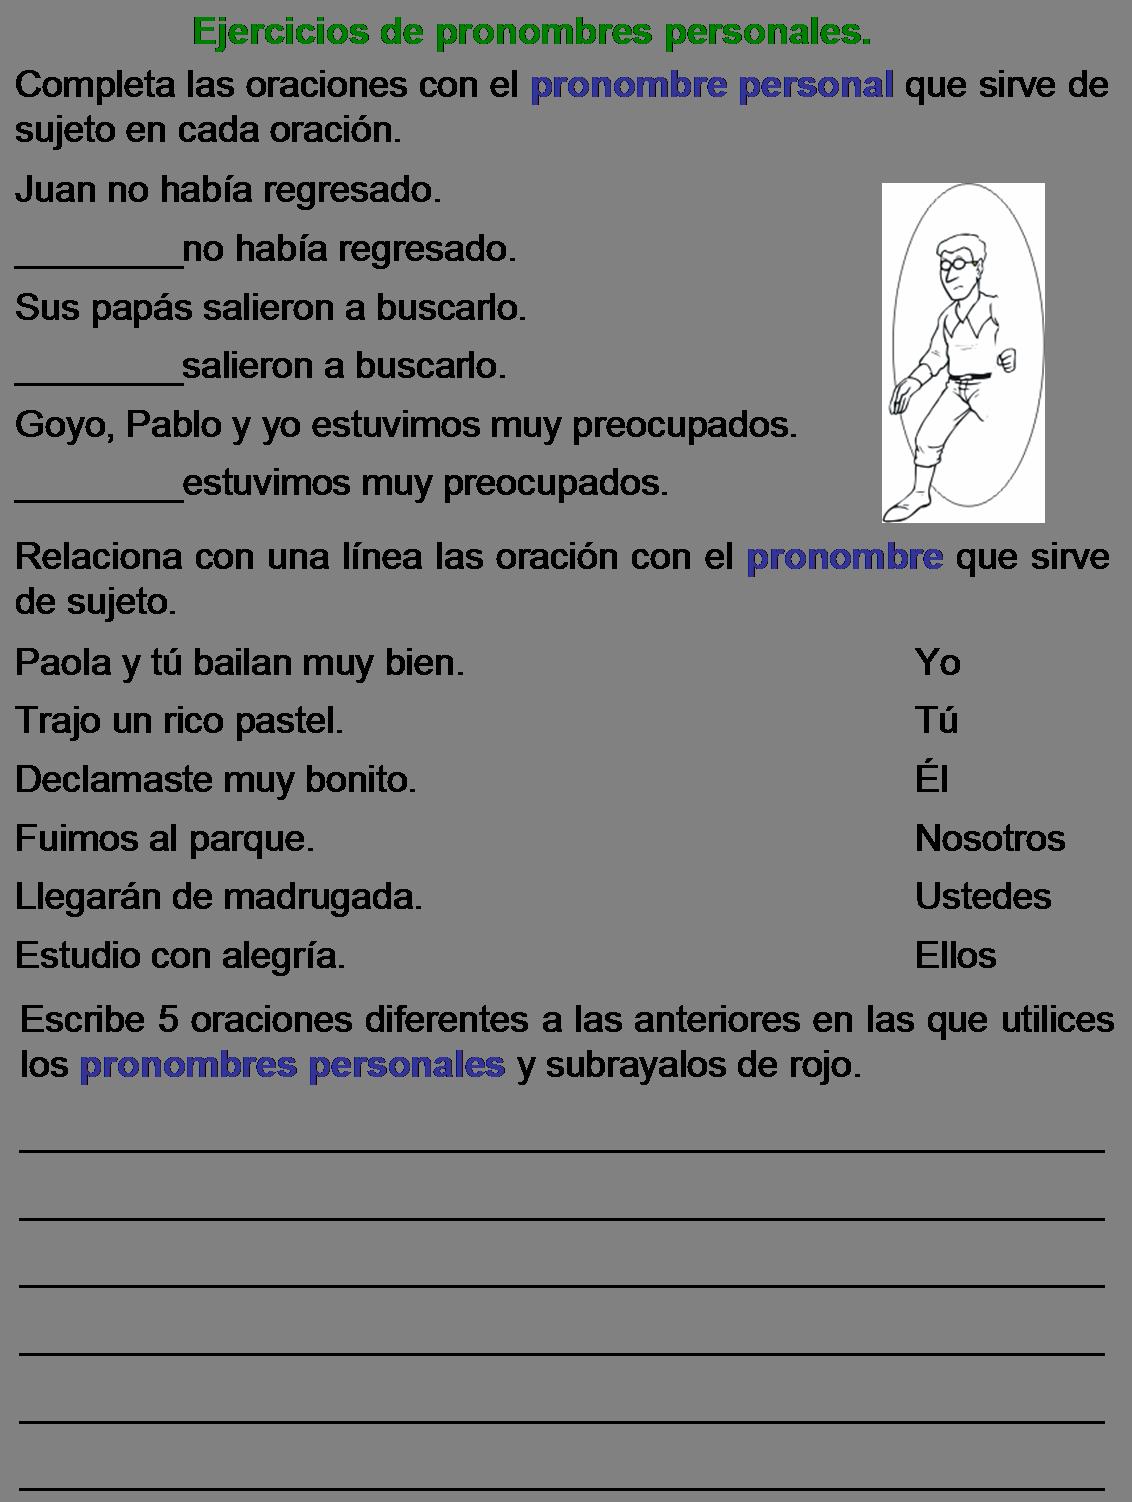 Pin About Atividades Em Espanhol On Los Pronombres Personales